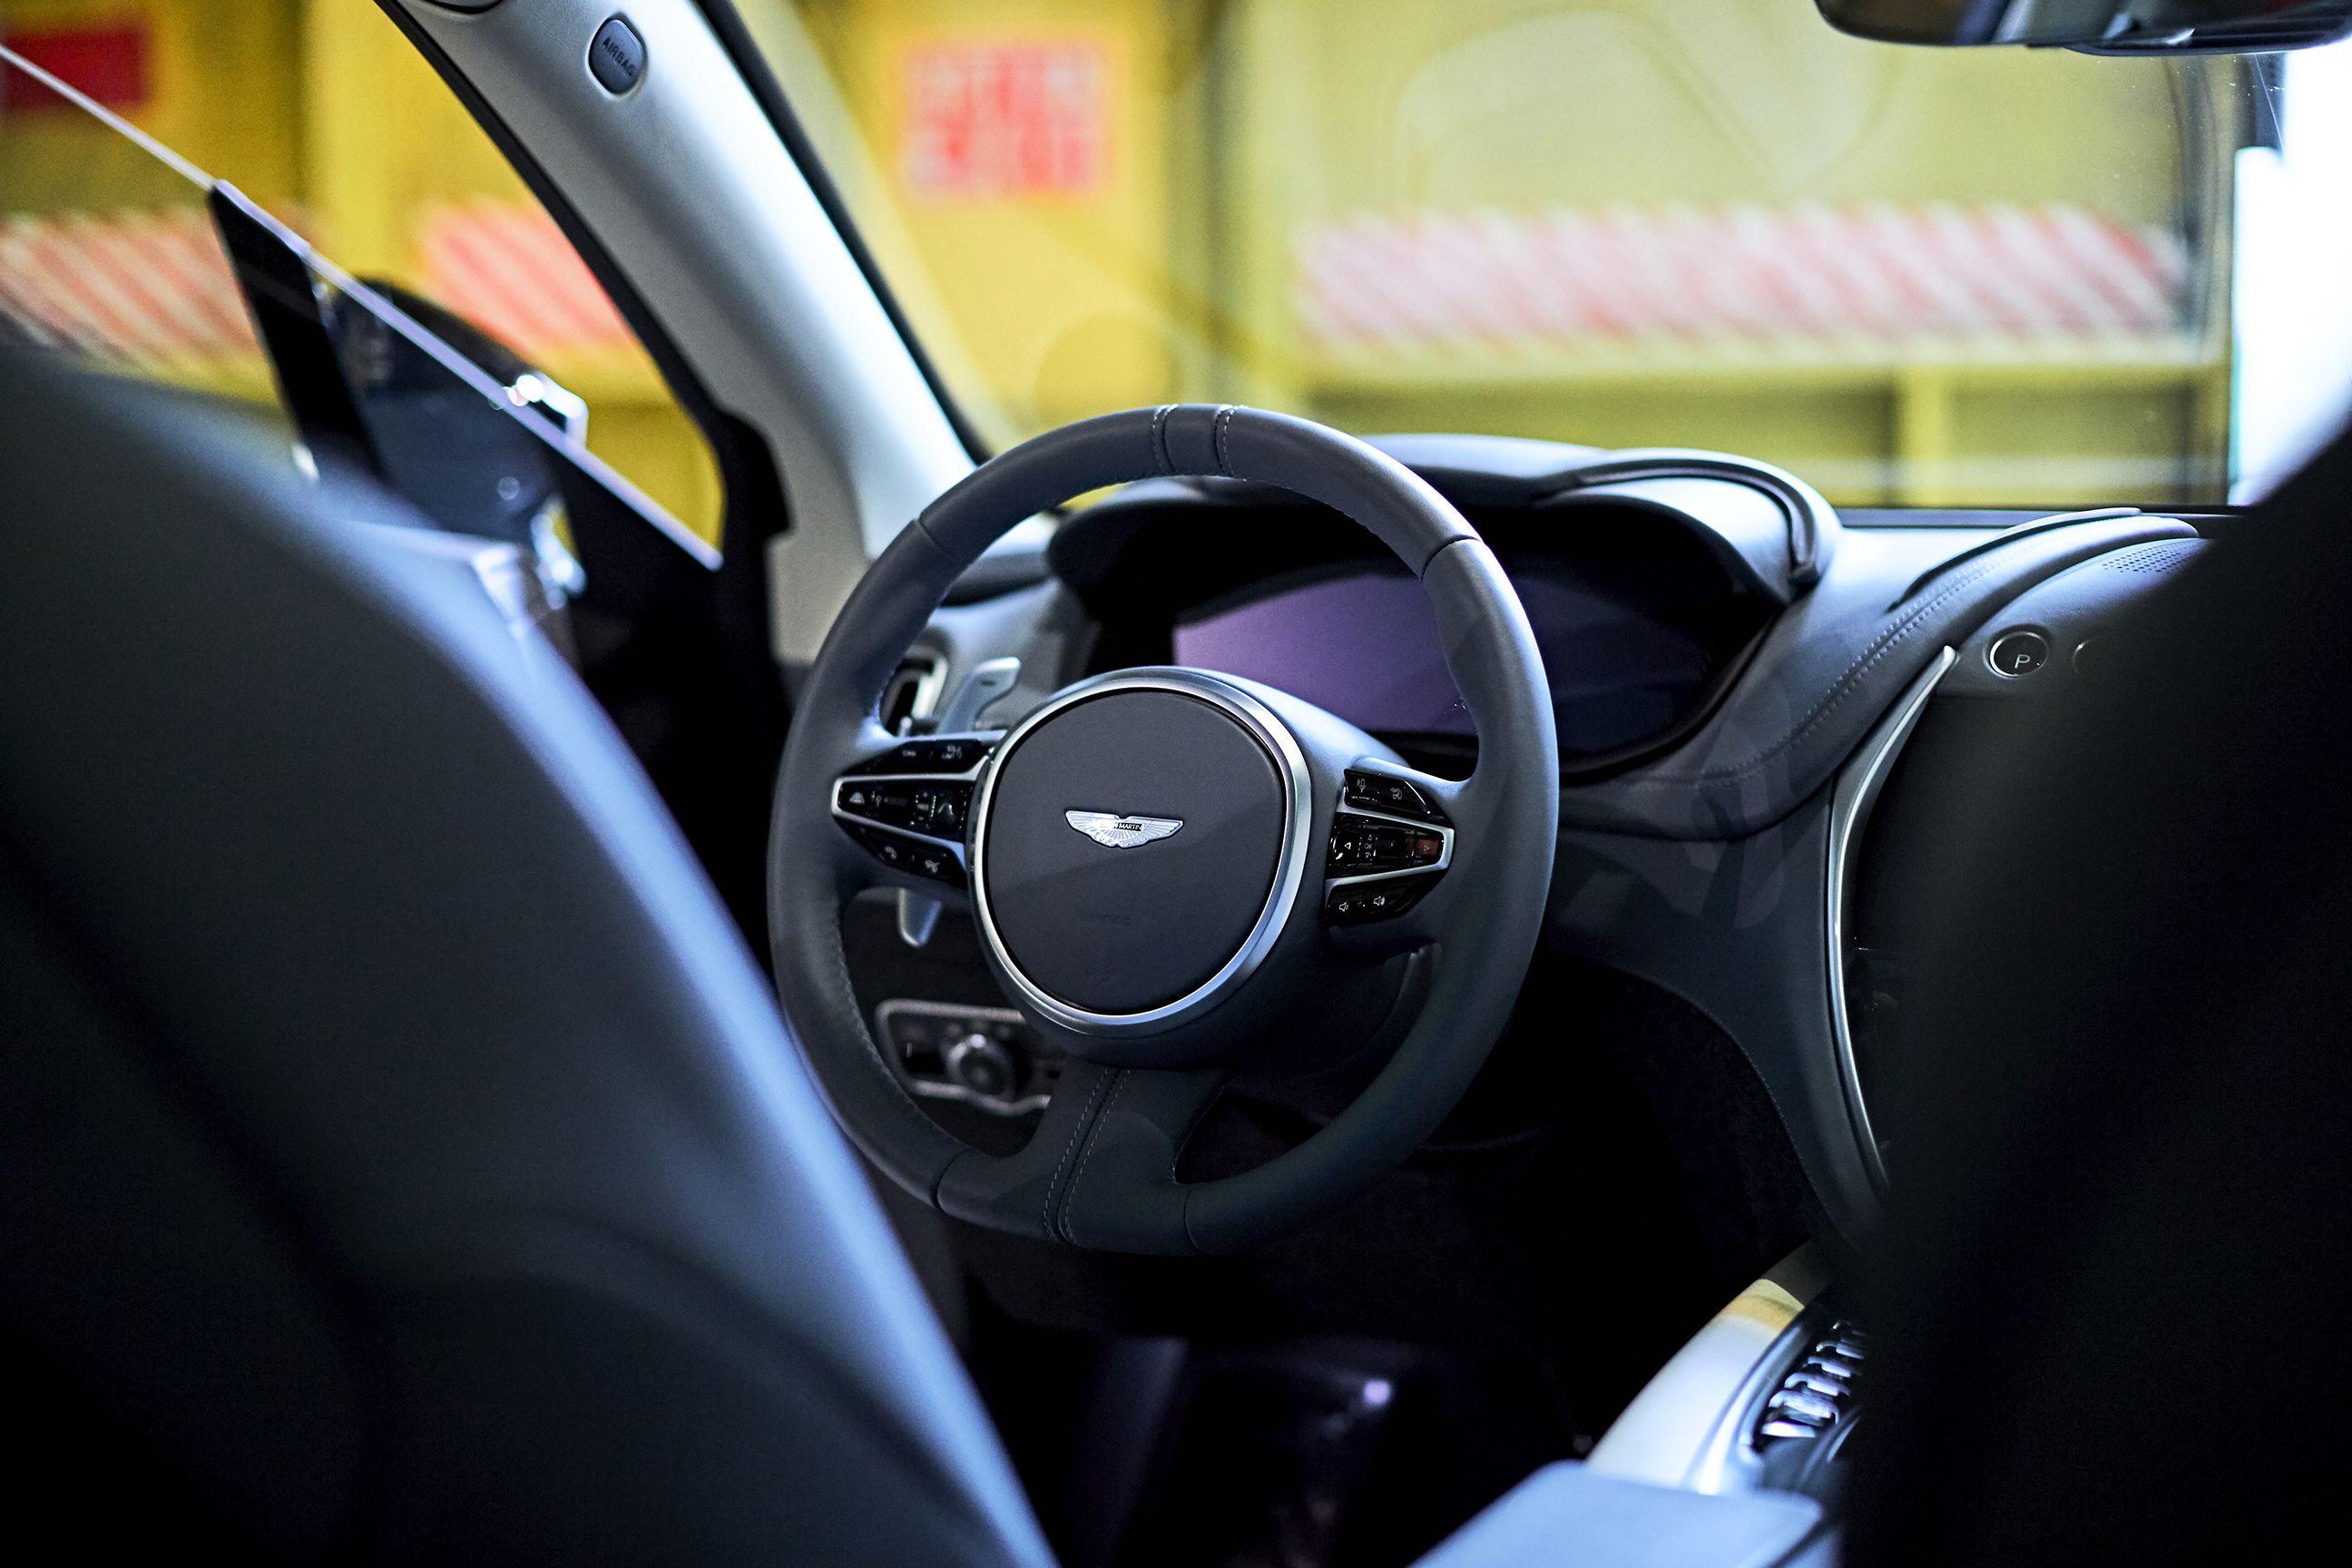 Gallery Inside The Aston Martin Dbx